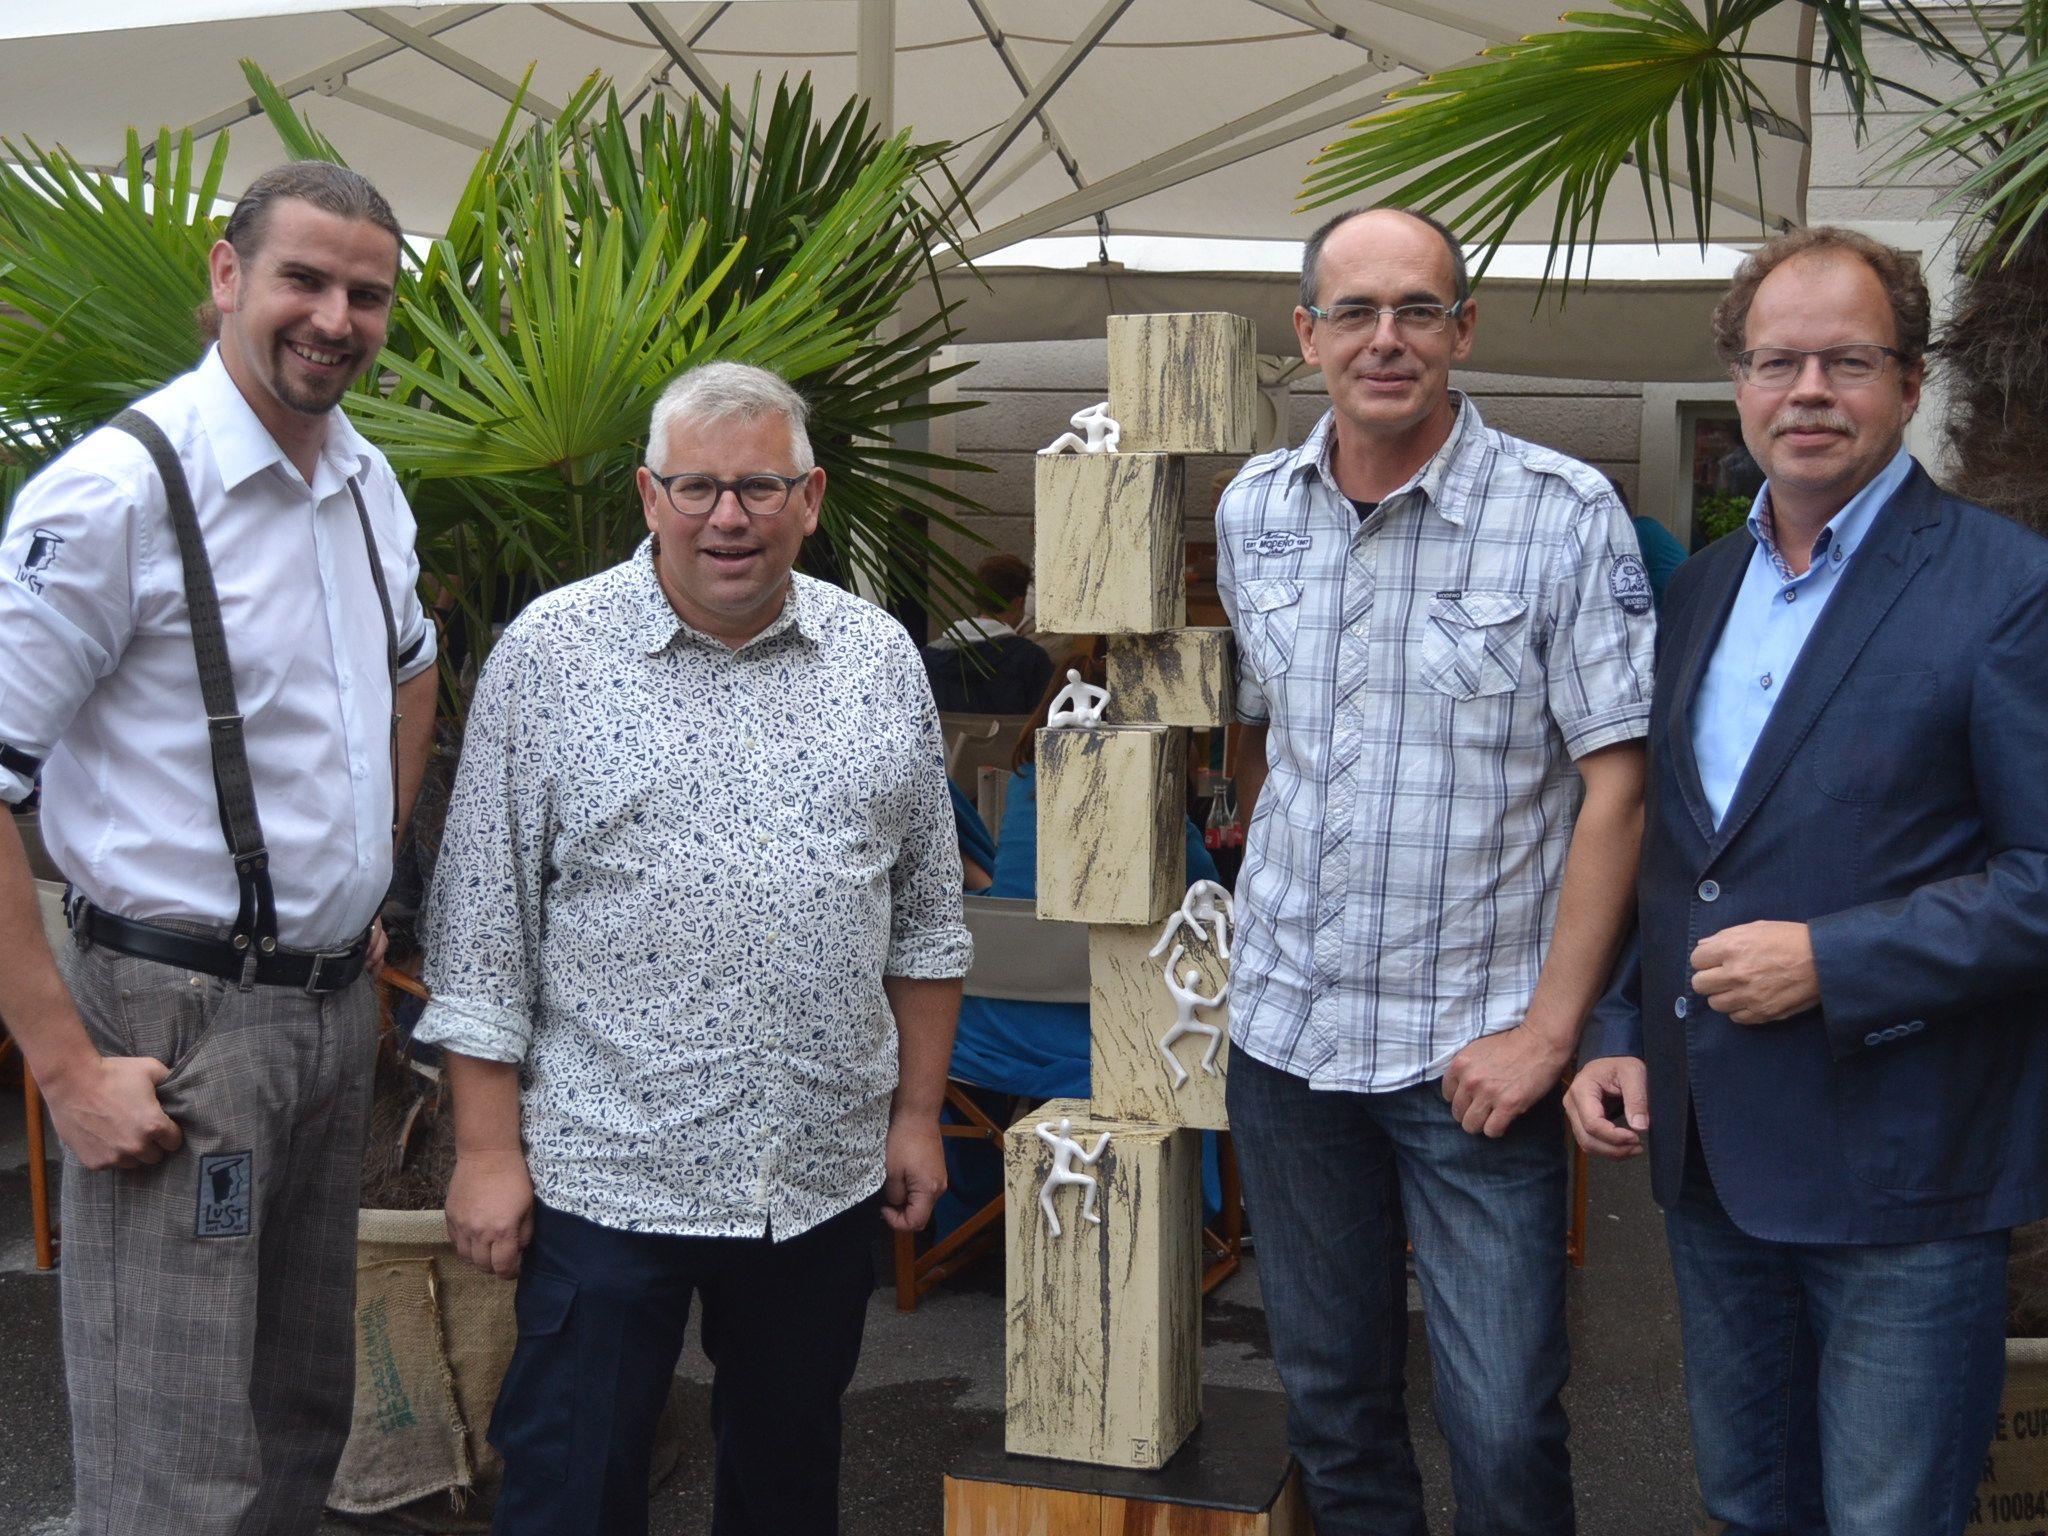 Matthias Buttazoni (LuSt Café-Bar), Kurator Erwin Buttazoni, Michael Hummer und Bgm. Florian Kasseroler.